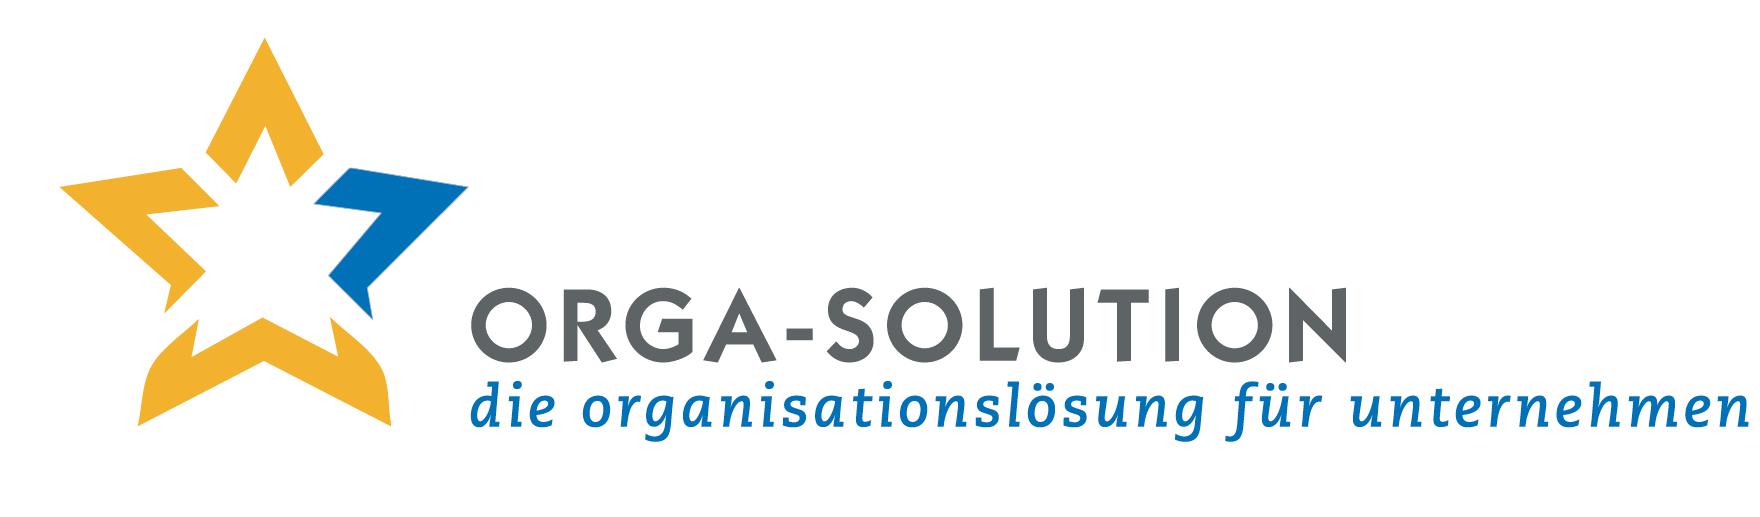 orga-solution-logo